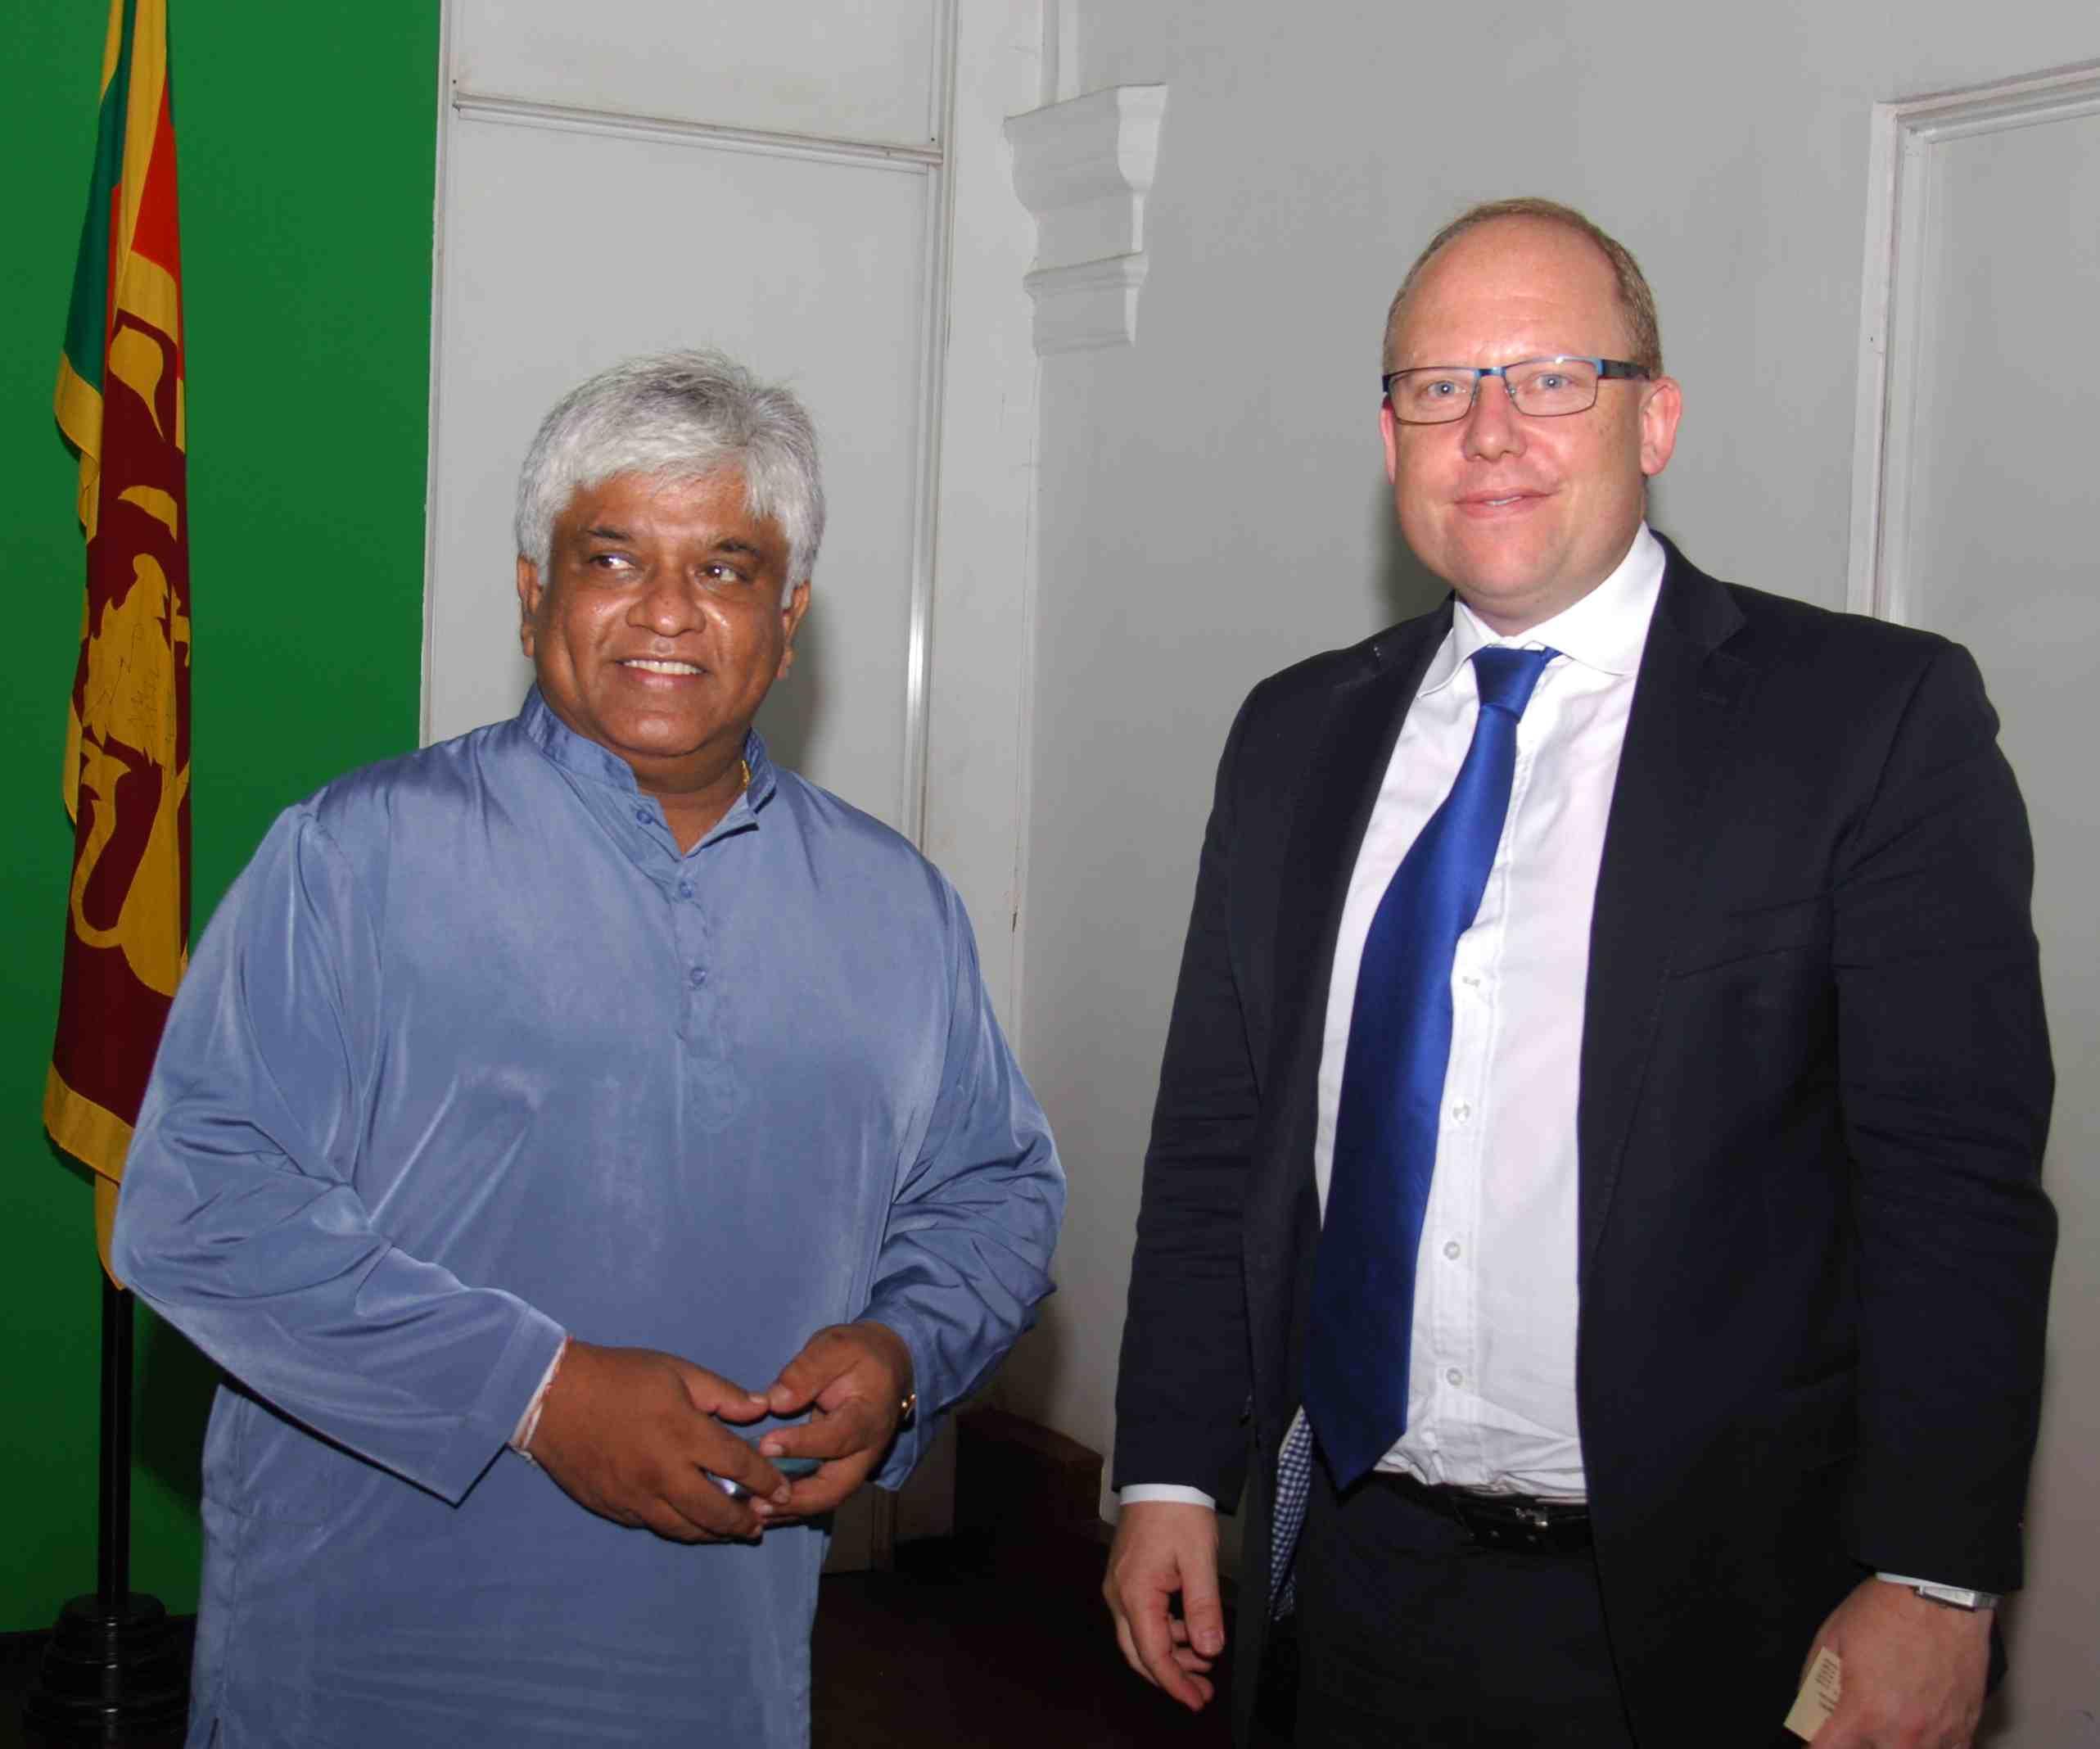 Bangladesh and New Zealand High Commissioners visit Hon. Minister of Ports, Shipping and Aviation Arjuna Ranatunga